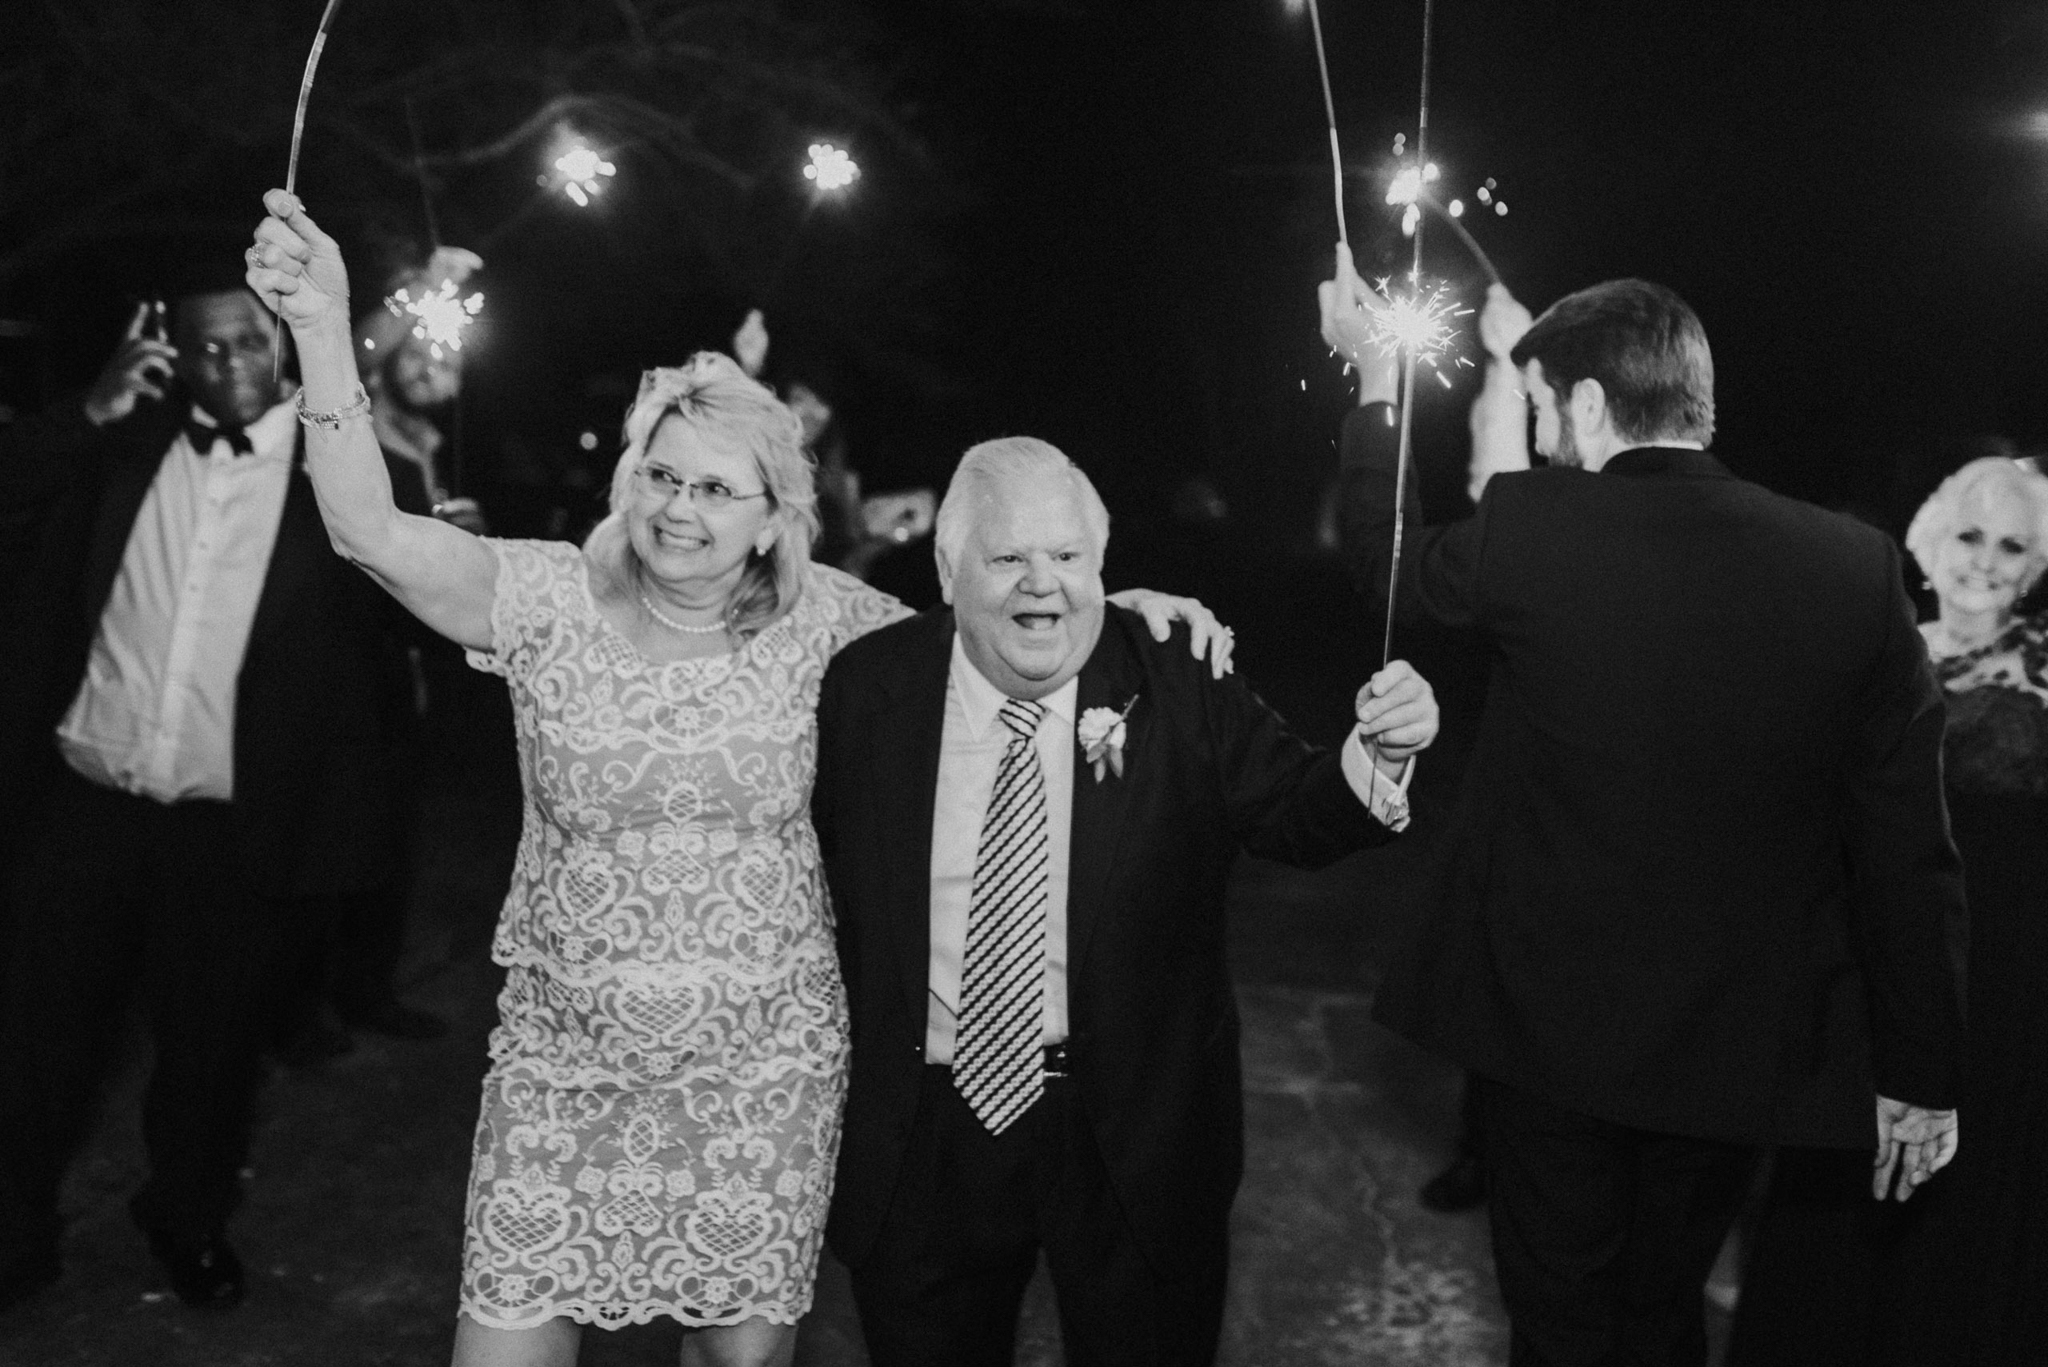 Houston Wedding Photographer-Intimate Texas Backyard Wedding- Houston Wedding Photographer -Kristen Giles Photography-62.jpg